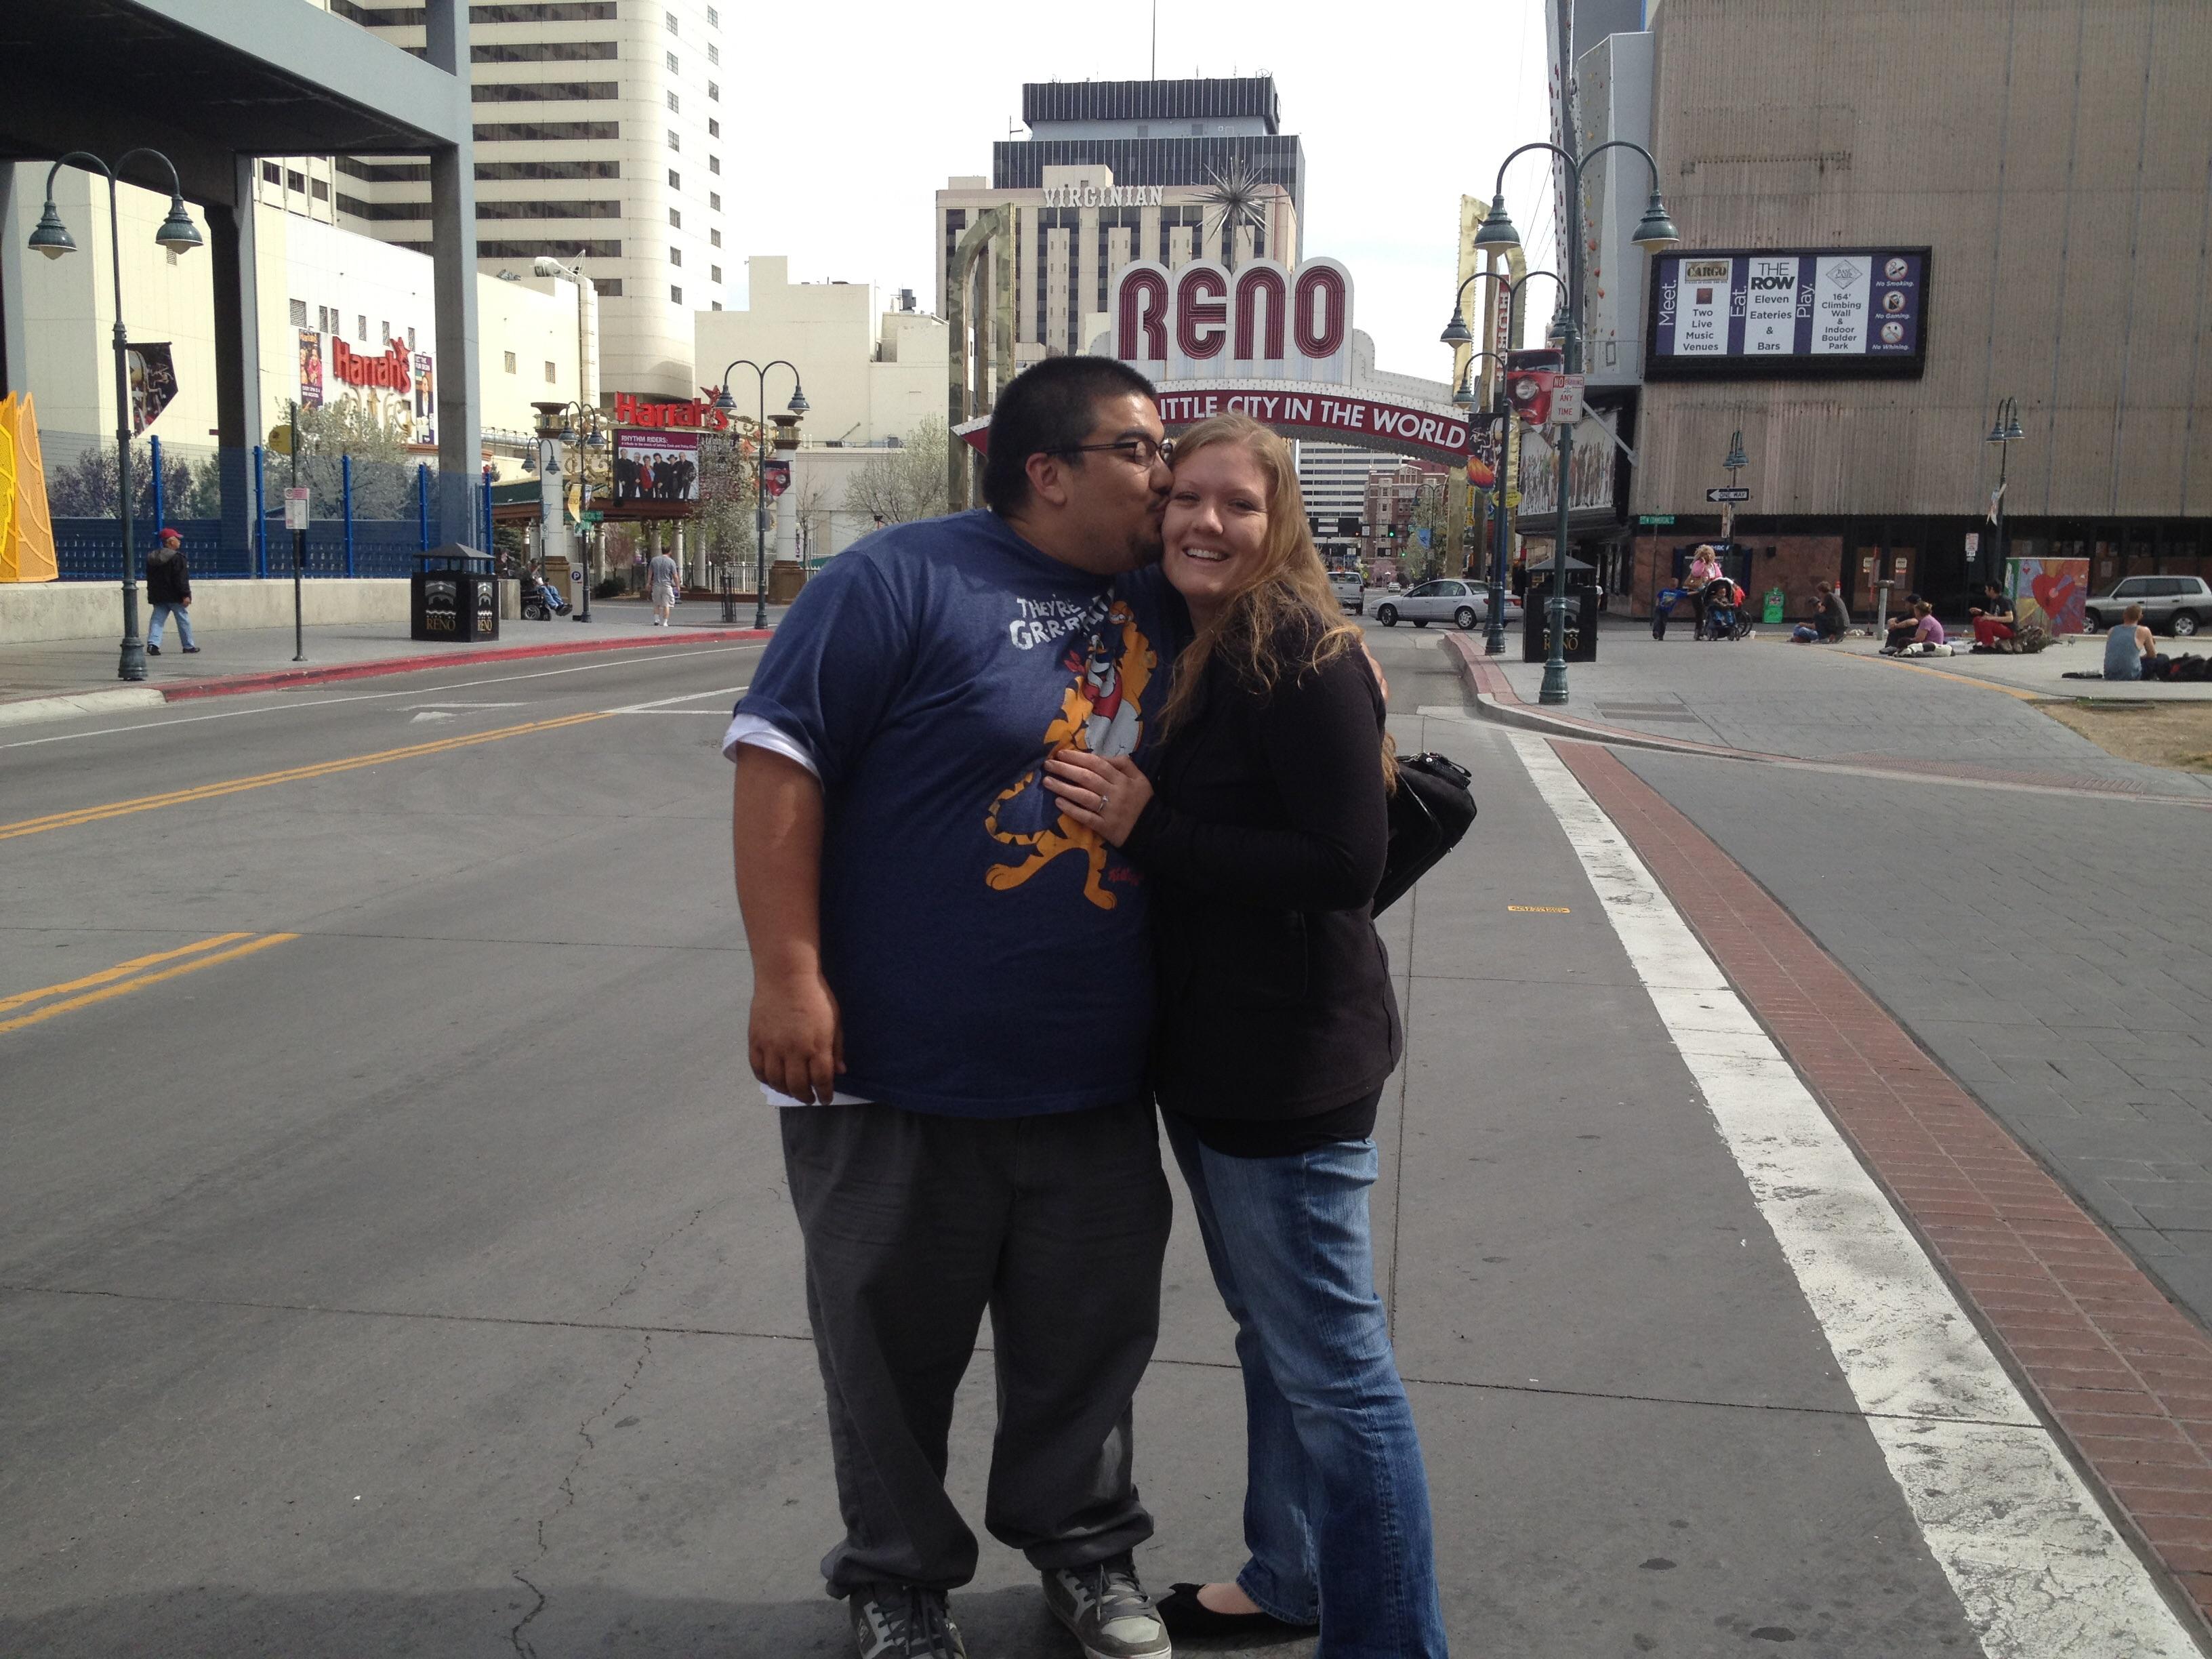 Anna Pepita and her husband